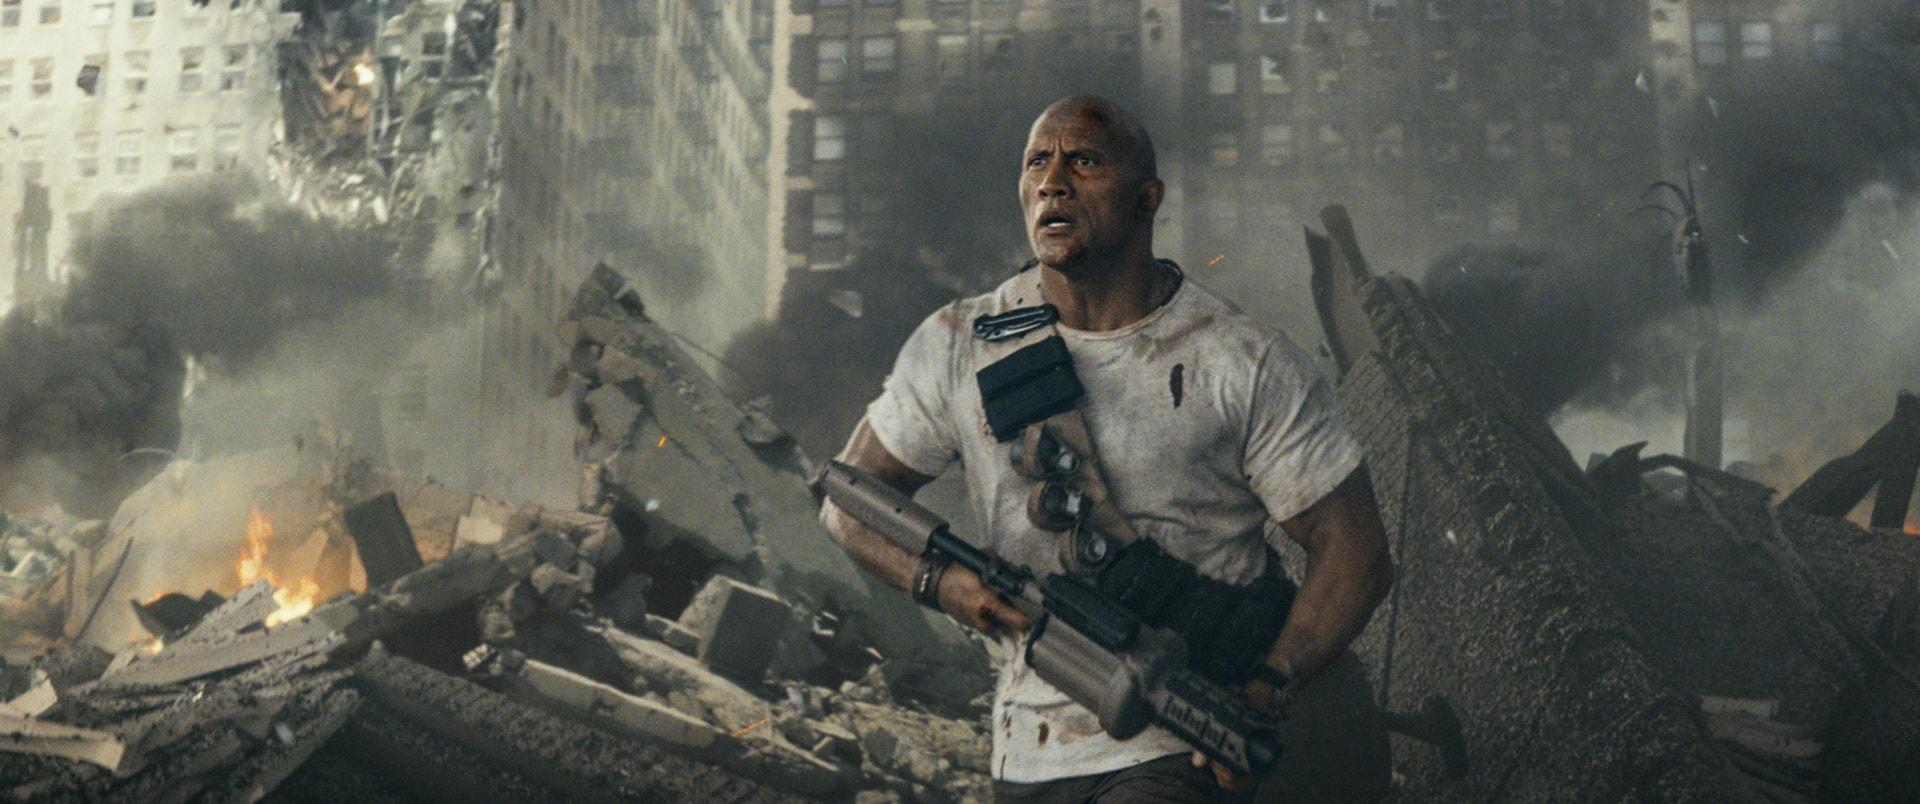 "DWAYNE JOHNSON as Davis Okoye in New Line Cinema's action adventure ""RAMPAGE,"" a Warner Bros. Pictures' release."